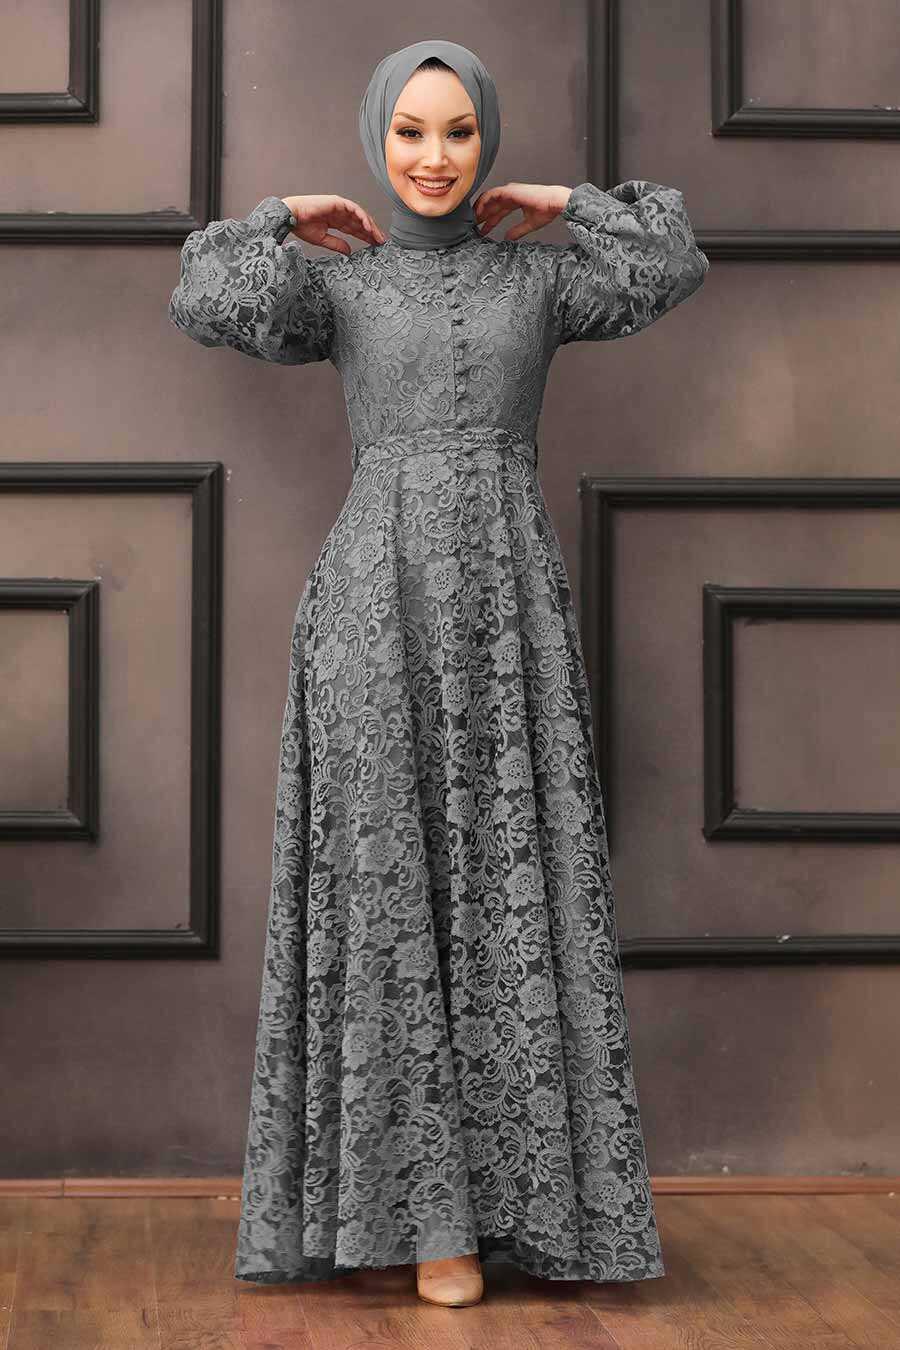 Grey Hijab Evening Dress 5477GR